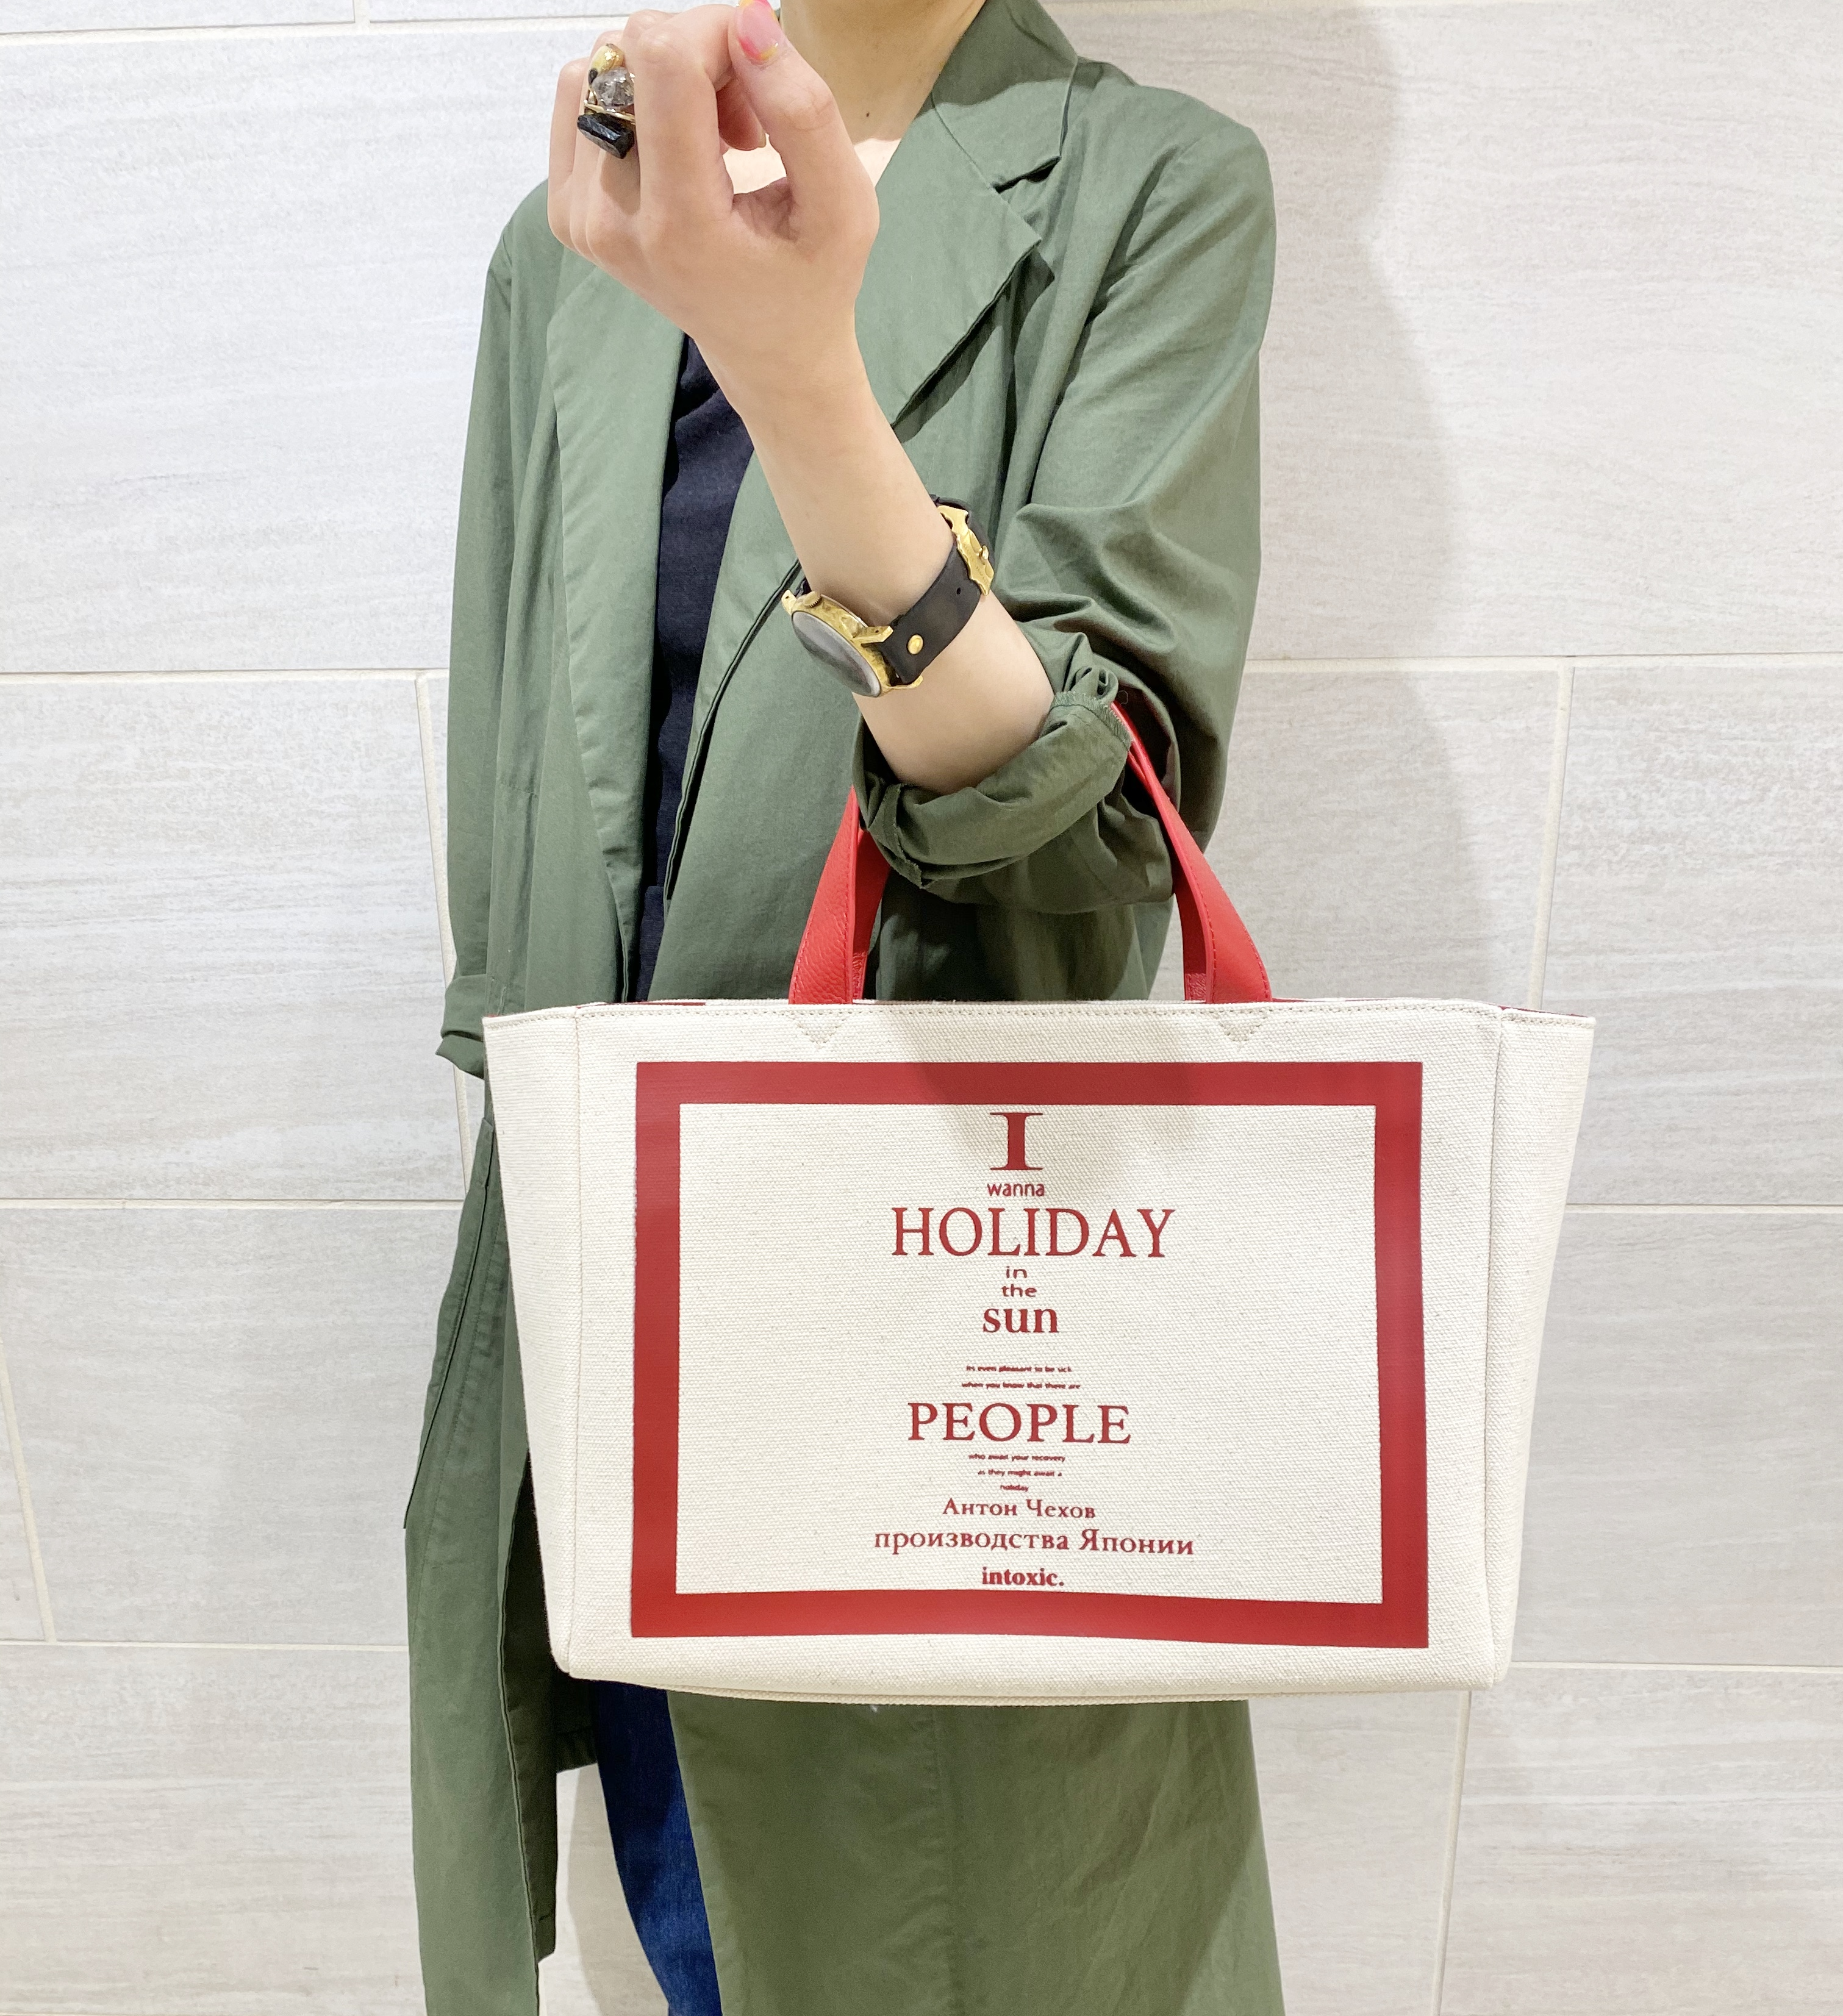 atnek by scrap book 京都 ポルタ イントキシック キャンパスバッグ ショルダーバッグ 肩がけ トートバッグ トート